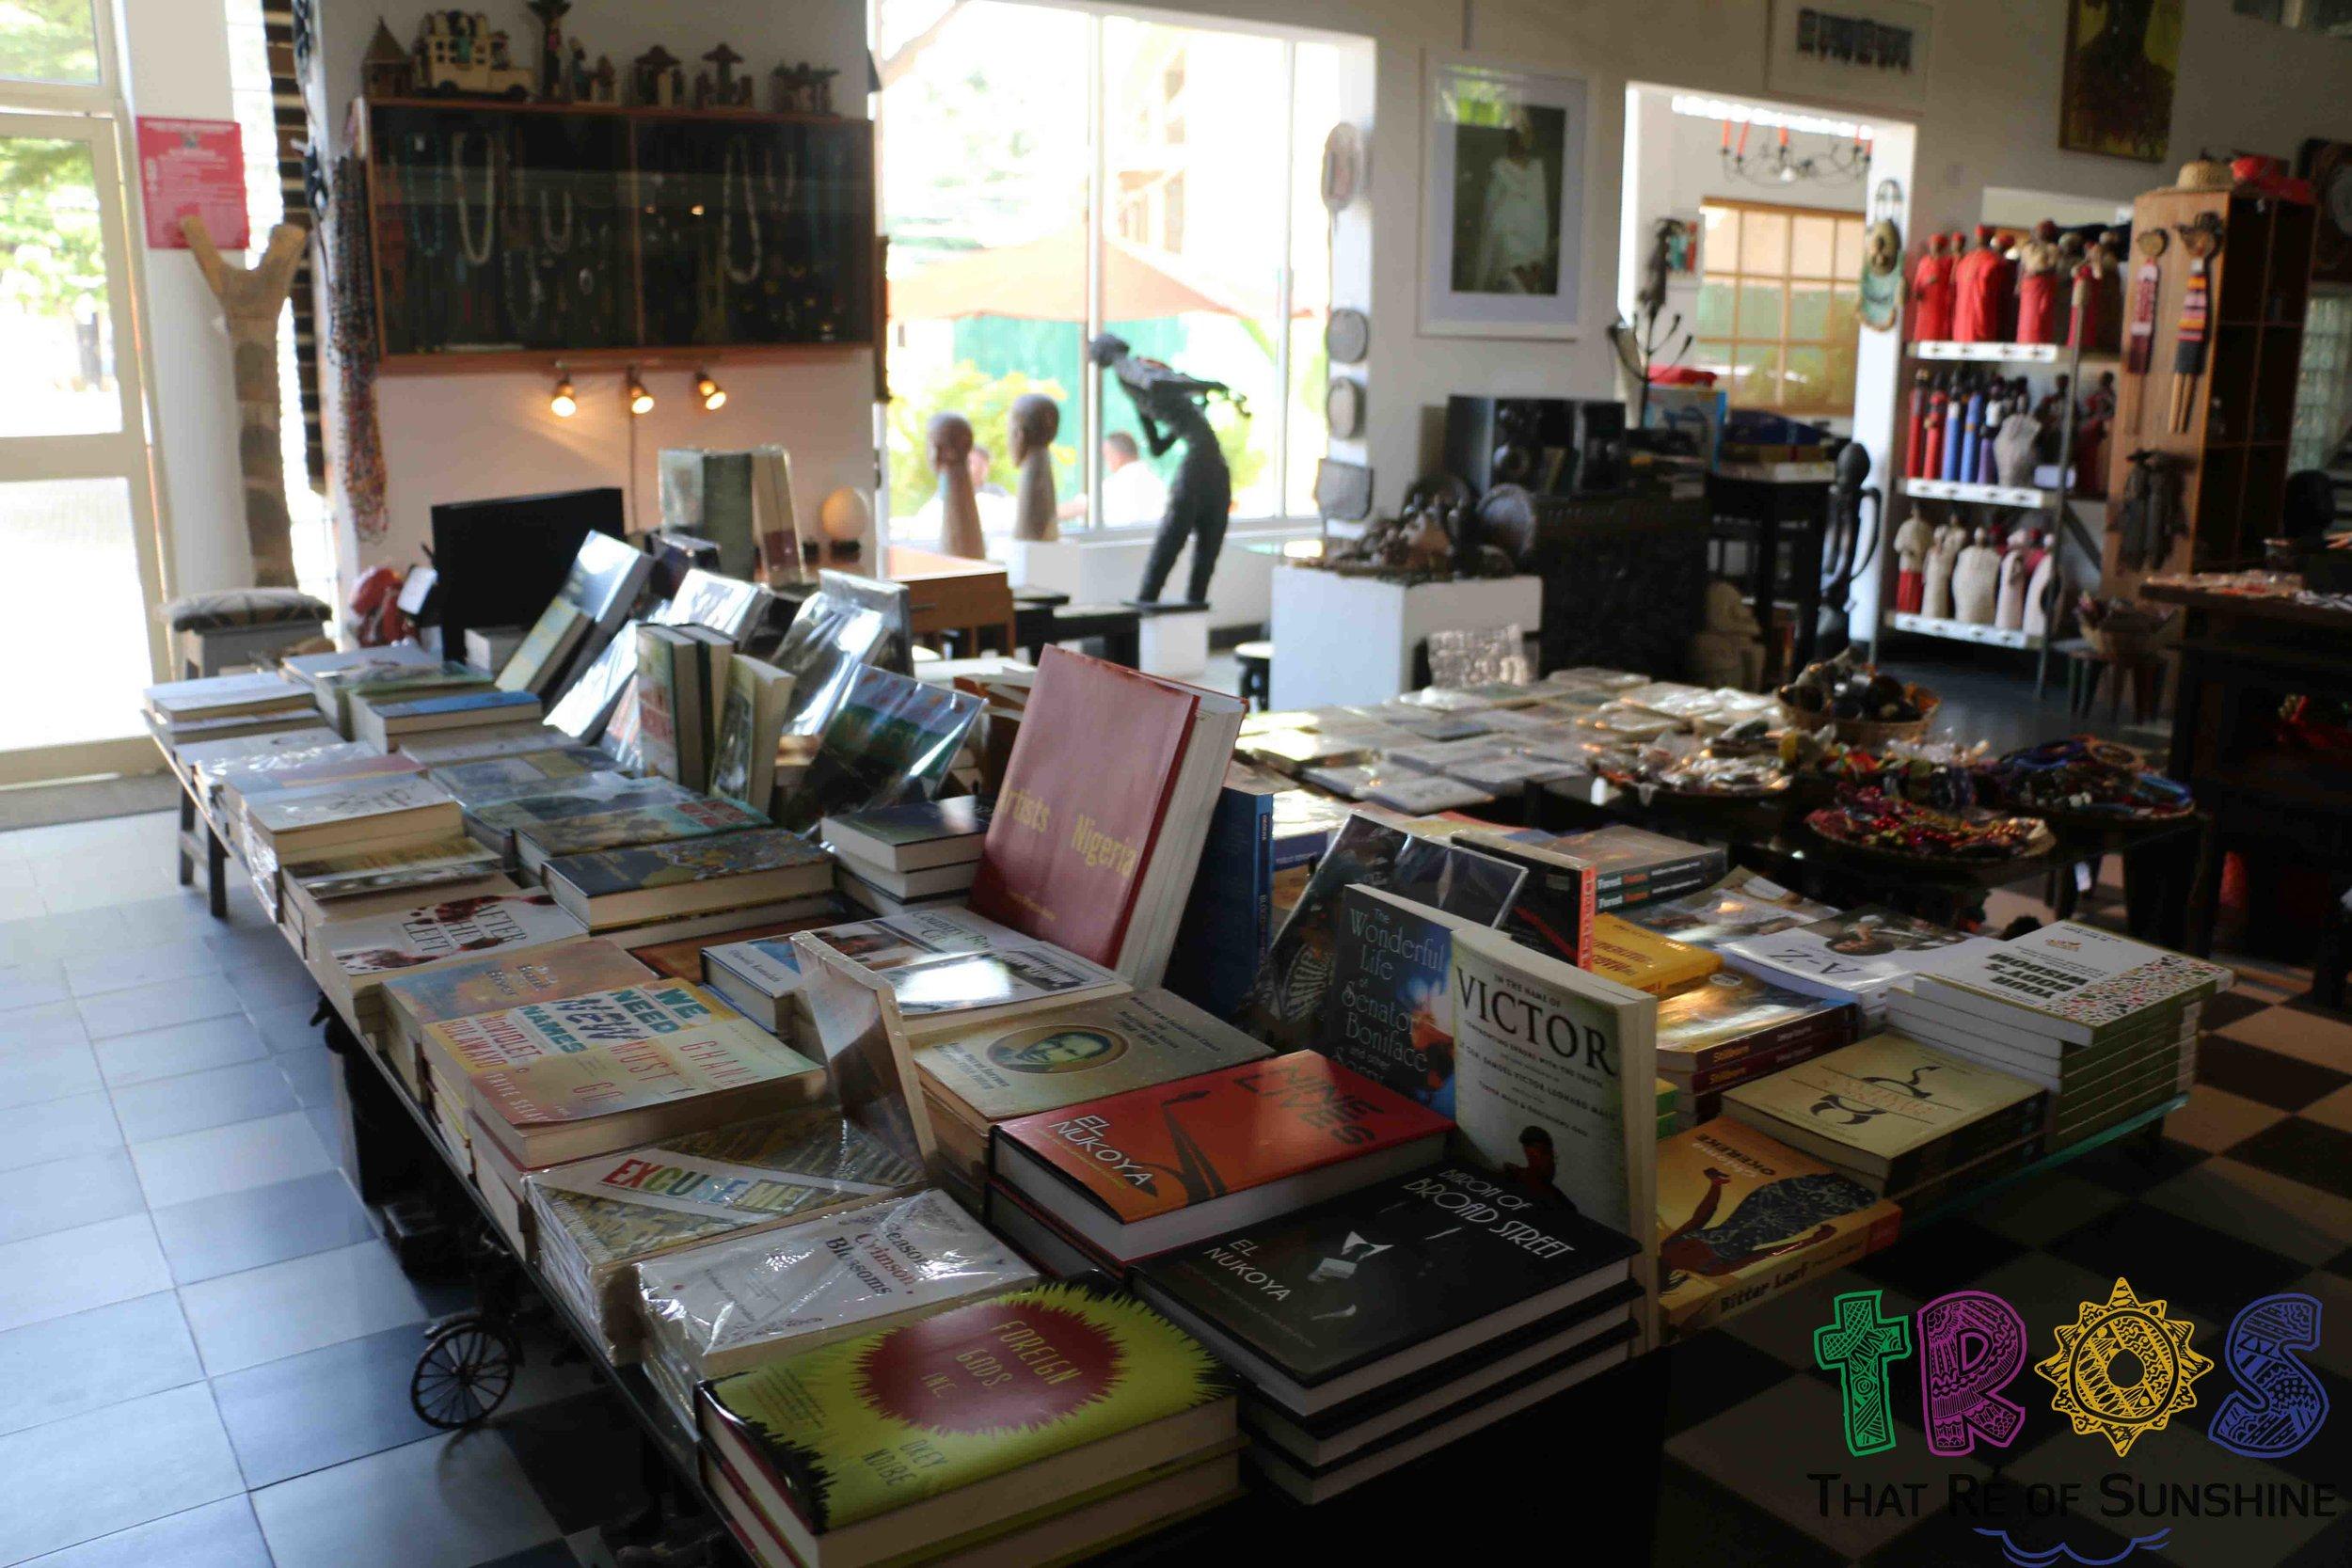 The-Sunshine-Book-Club-June-4.jpg